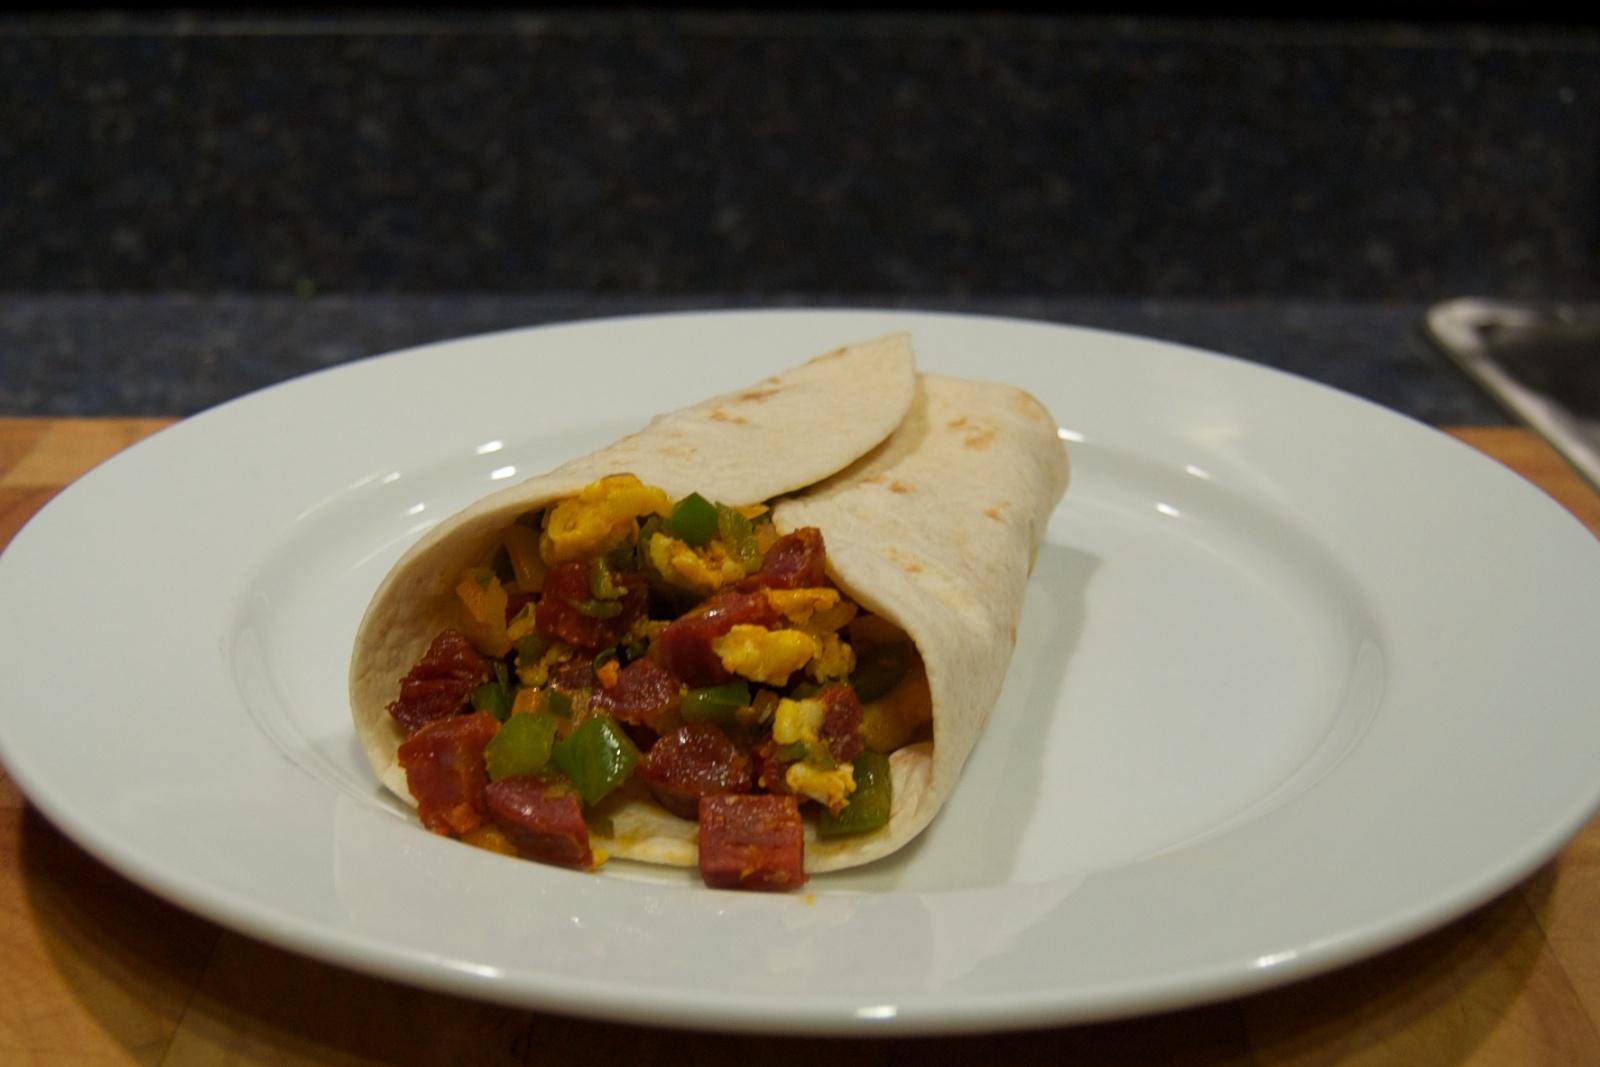 http://blog.rickk.com/food/2012/02/01/ate.2012.02.01.b.jpg